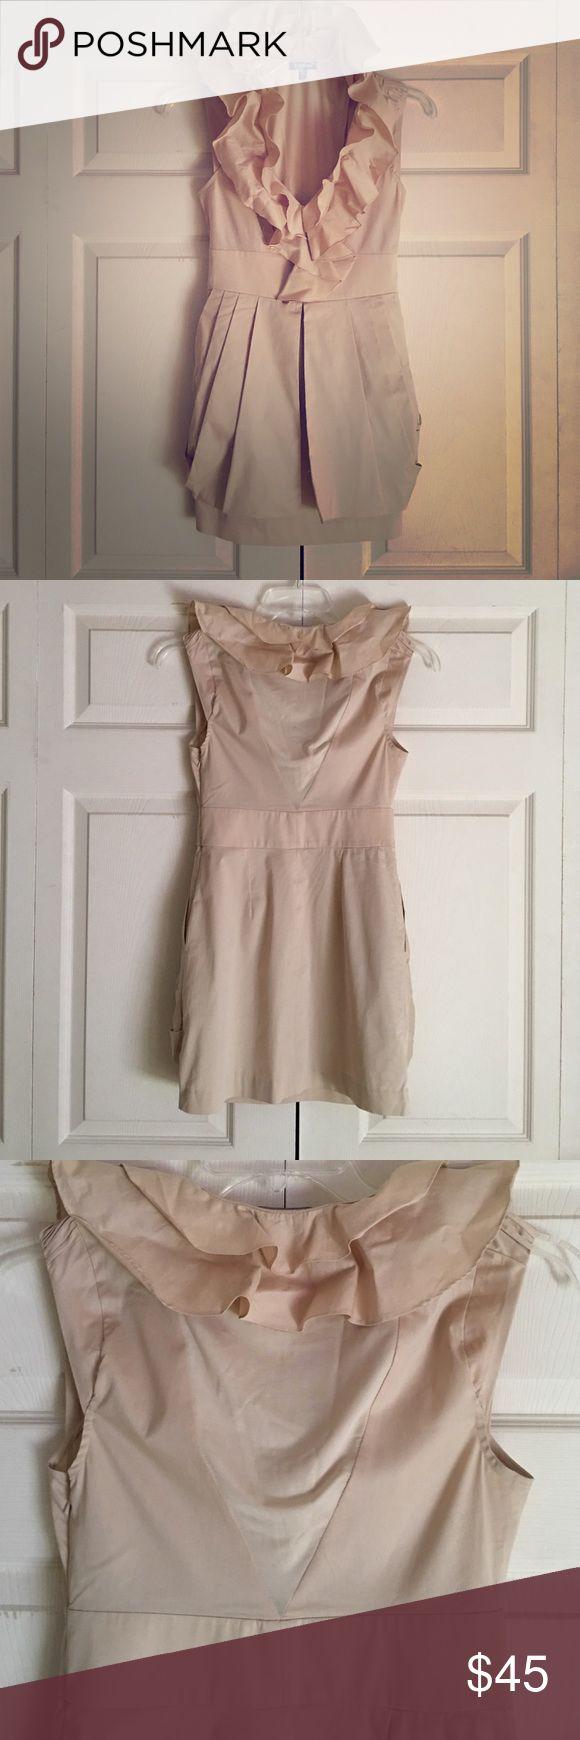 "🔥💥BIG SALE🔥🔥""BEBE"" Beige Mini Dress Sz S💥🔥🎊 🔥🔥💥""BEBE"" Beige Very Cute  Mini Dress with Sheer back. Never been worn!!! New Without Tag Sz S 💥🔥🔥 bebe Dresses Mini"